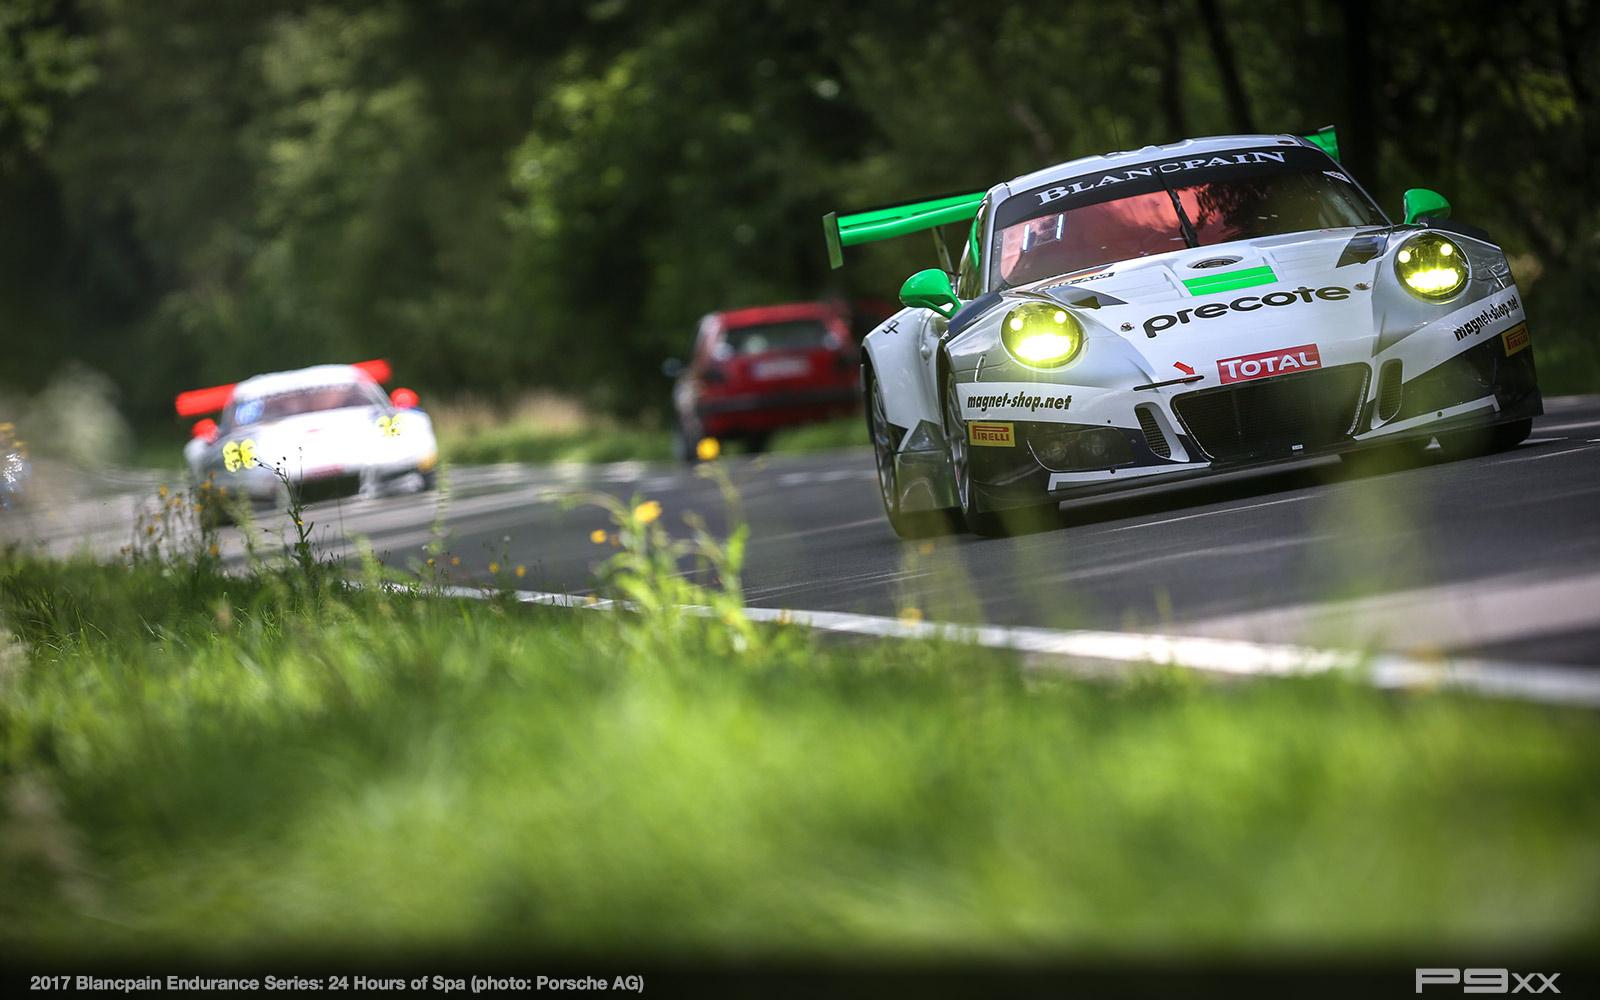 2017-24-Hours-of-Spa-Porsche-301